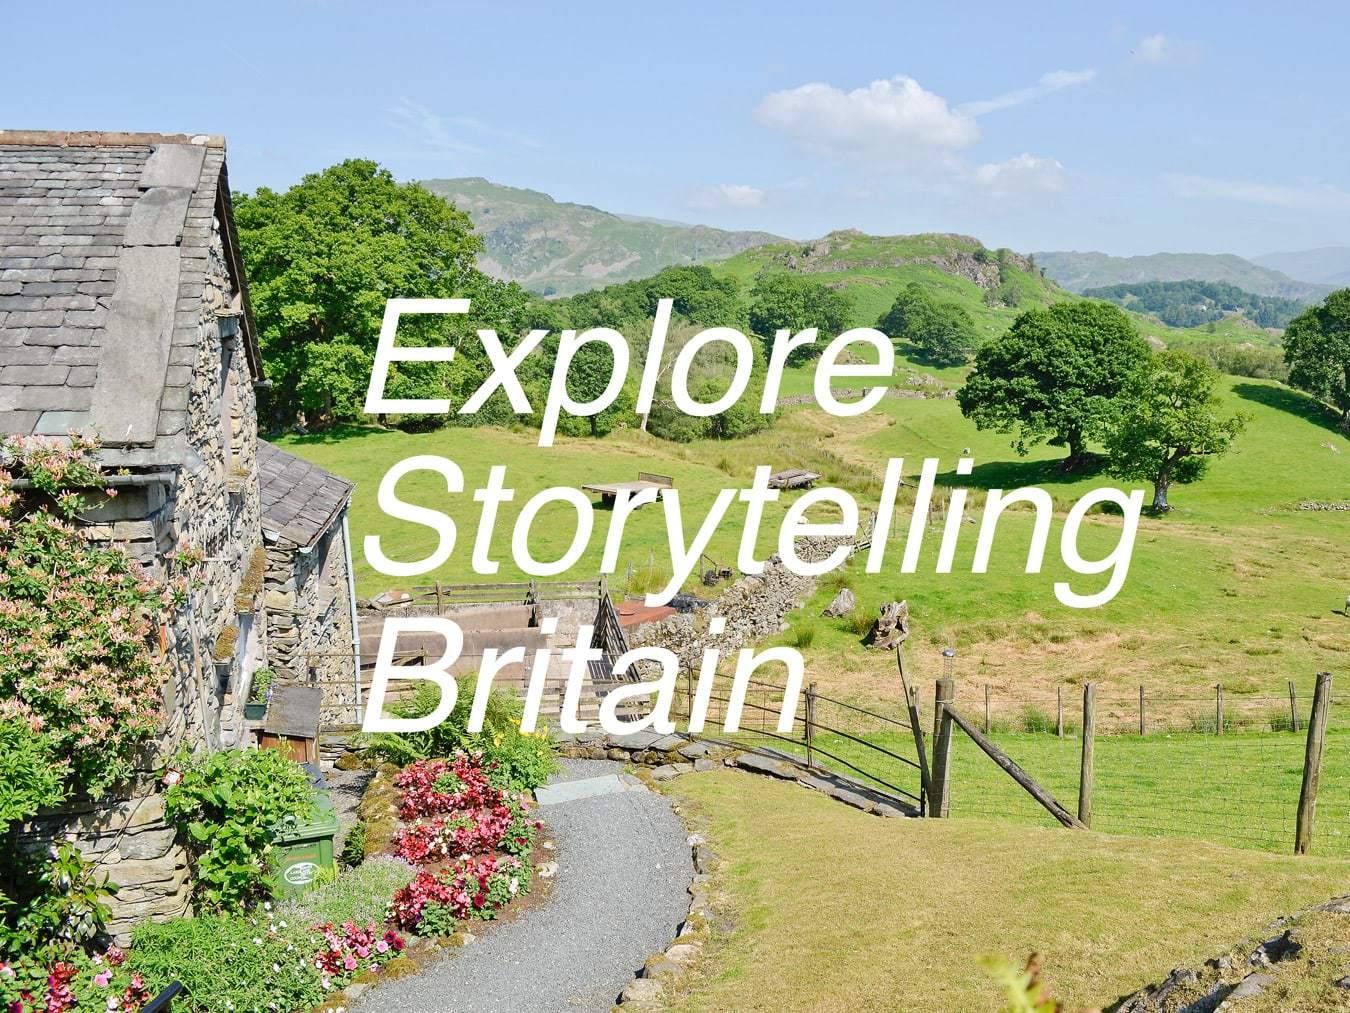 Explore Storytelling Britain